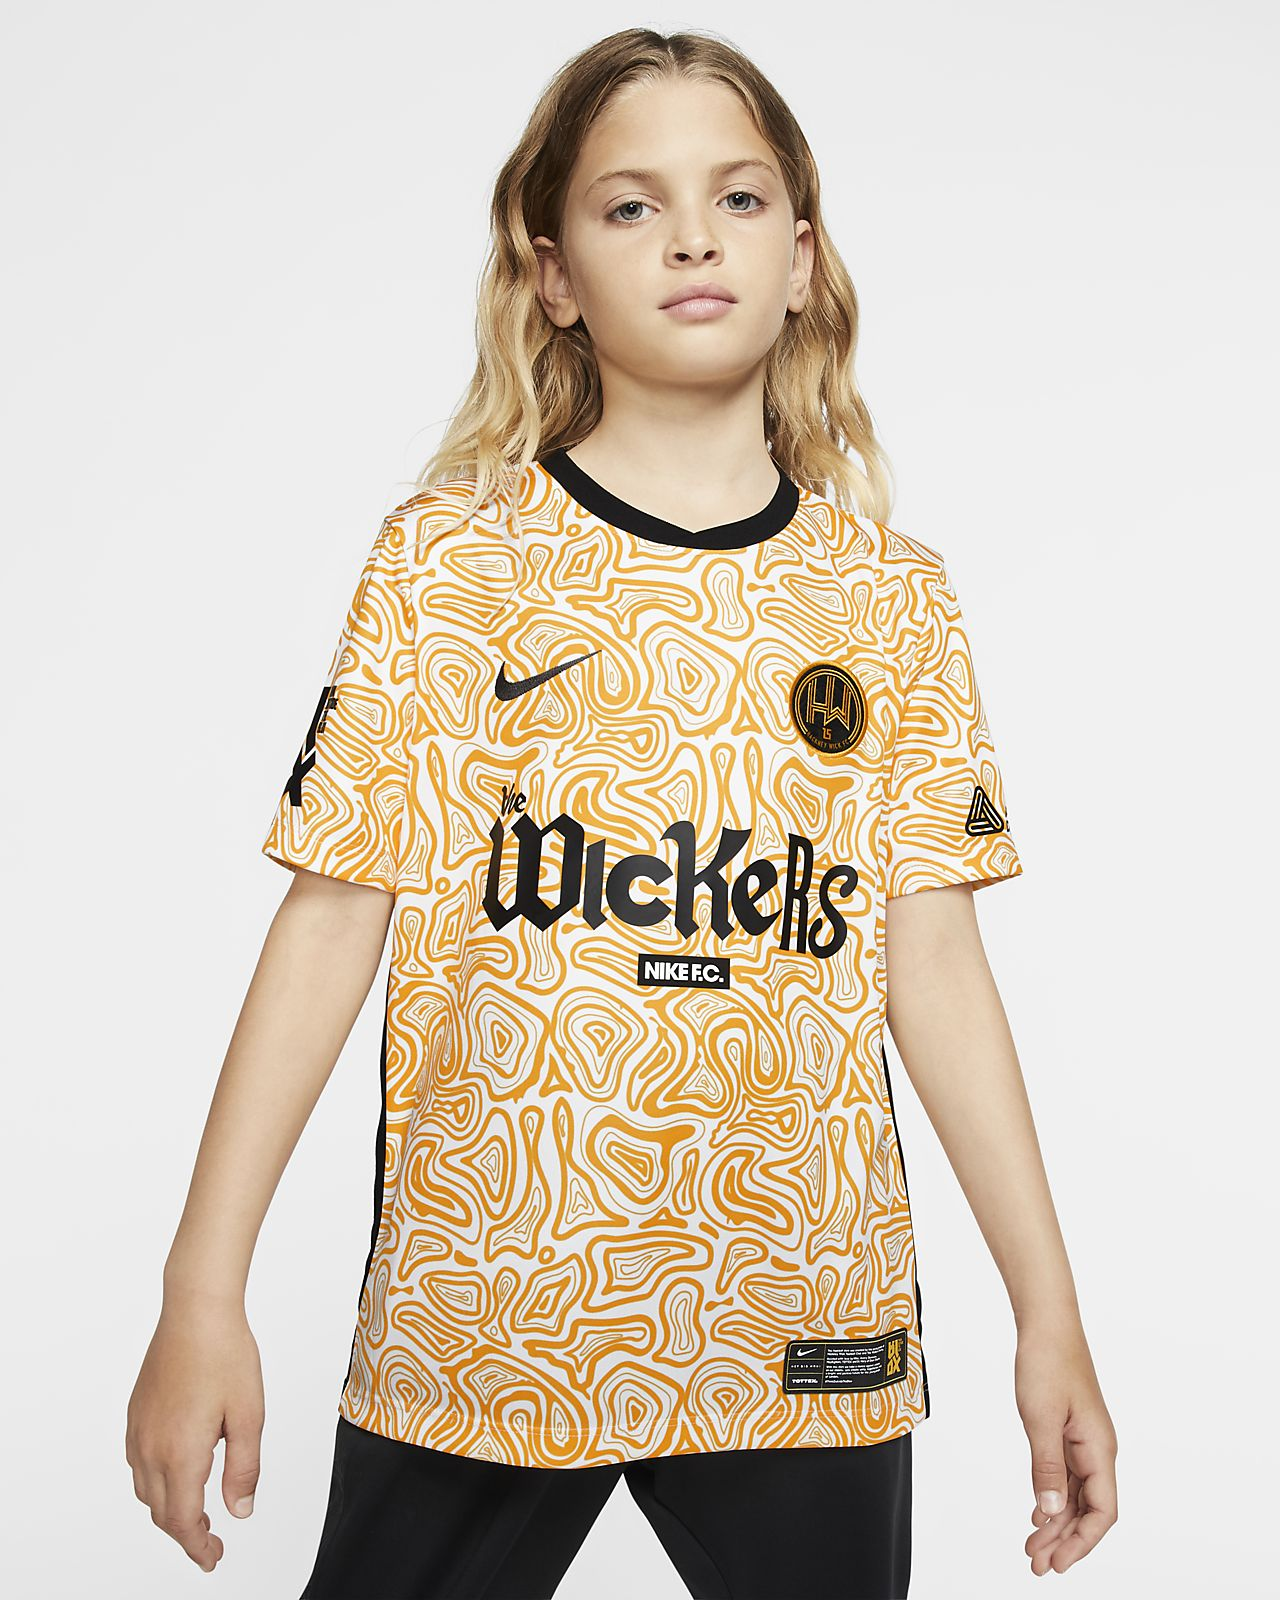 Hackney Wick FC 2ª Camiseta de fútbol - Niño/a